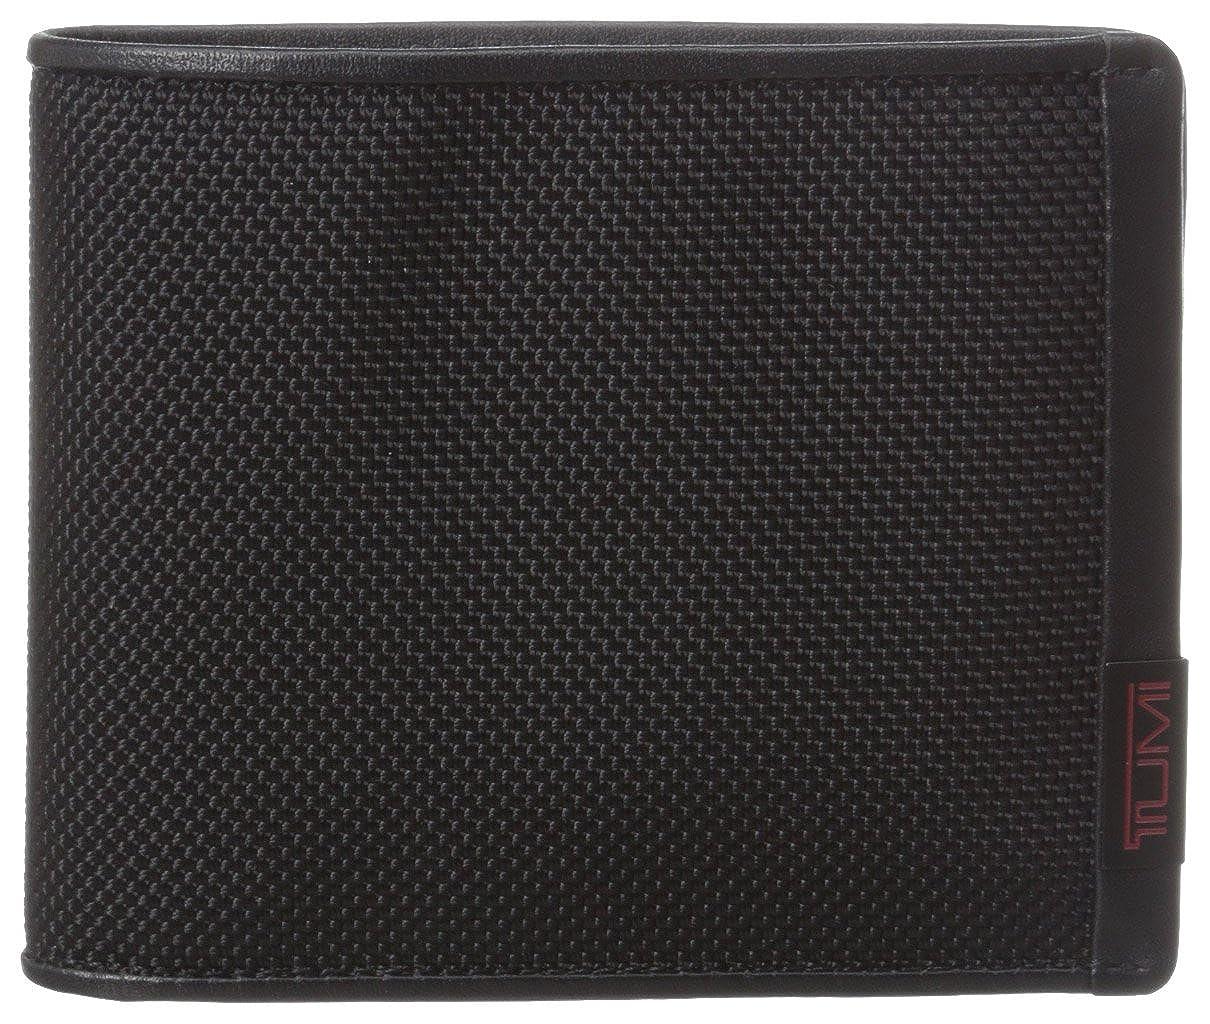 Tumi Men's Alpha Global Center RFID Blocking Flip ID Passcase Black One Size Tumi Men's Accessories 119232